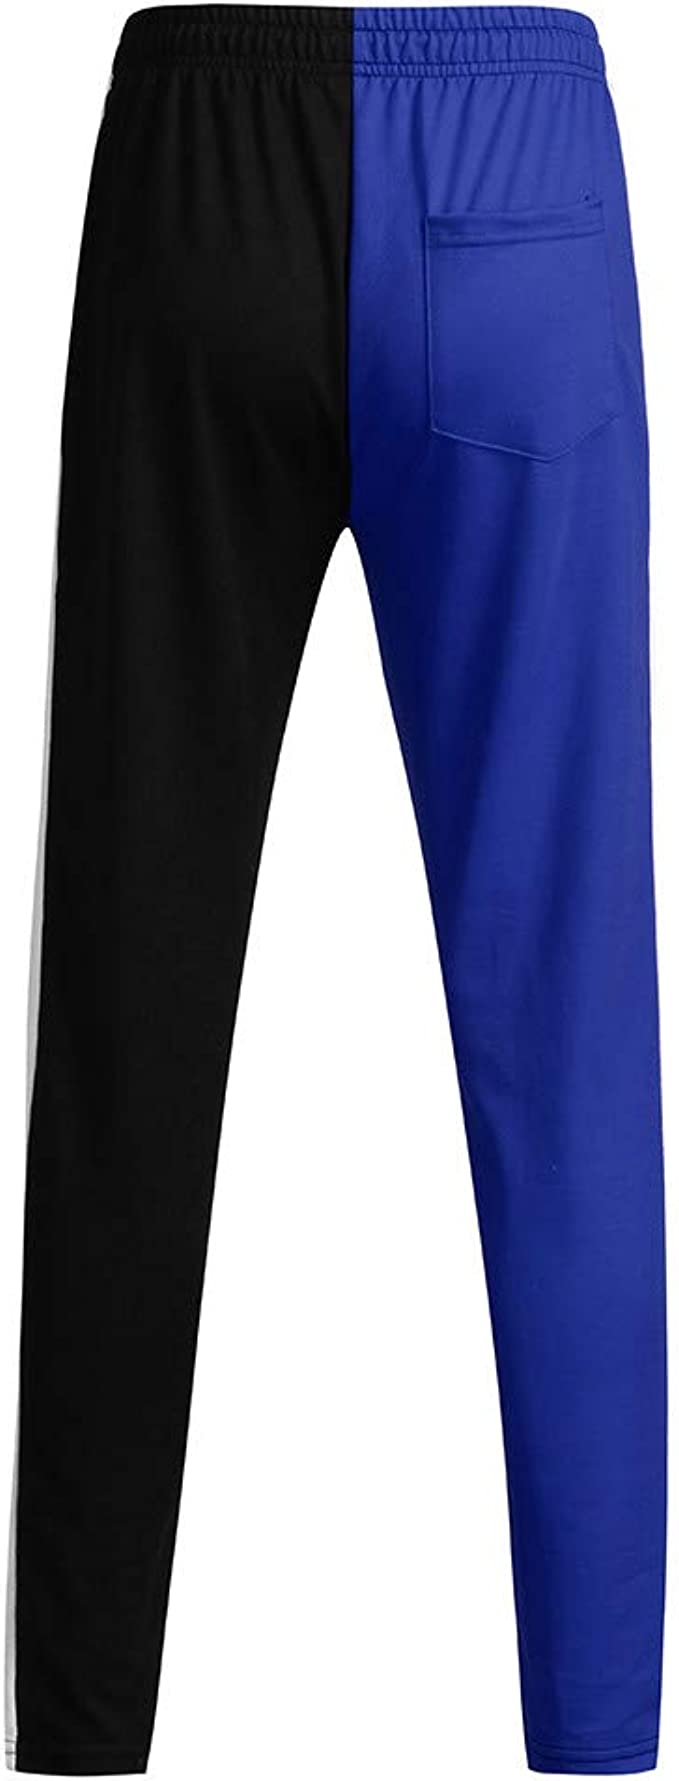 Pantalones Hombre Chandal Militar Moda 2019 Pantalones de chándal ...